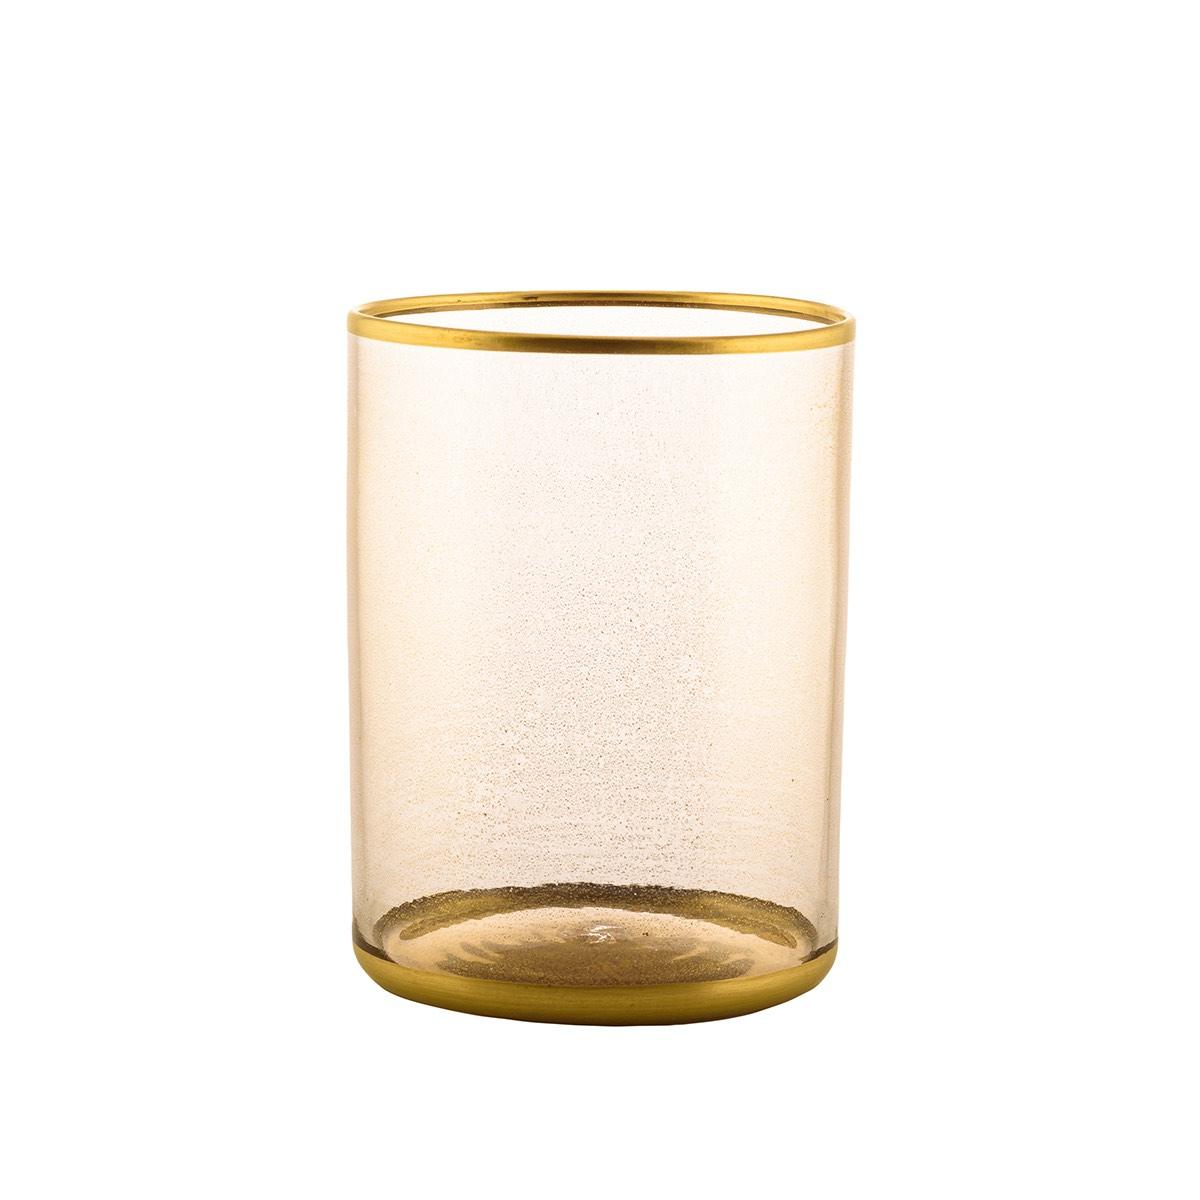 gold-oro-cylindrical-luxe-luxury-murano-glassware-tablescape